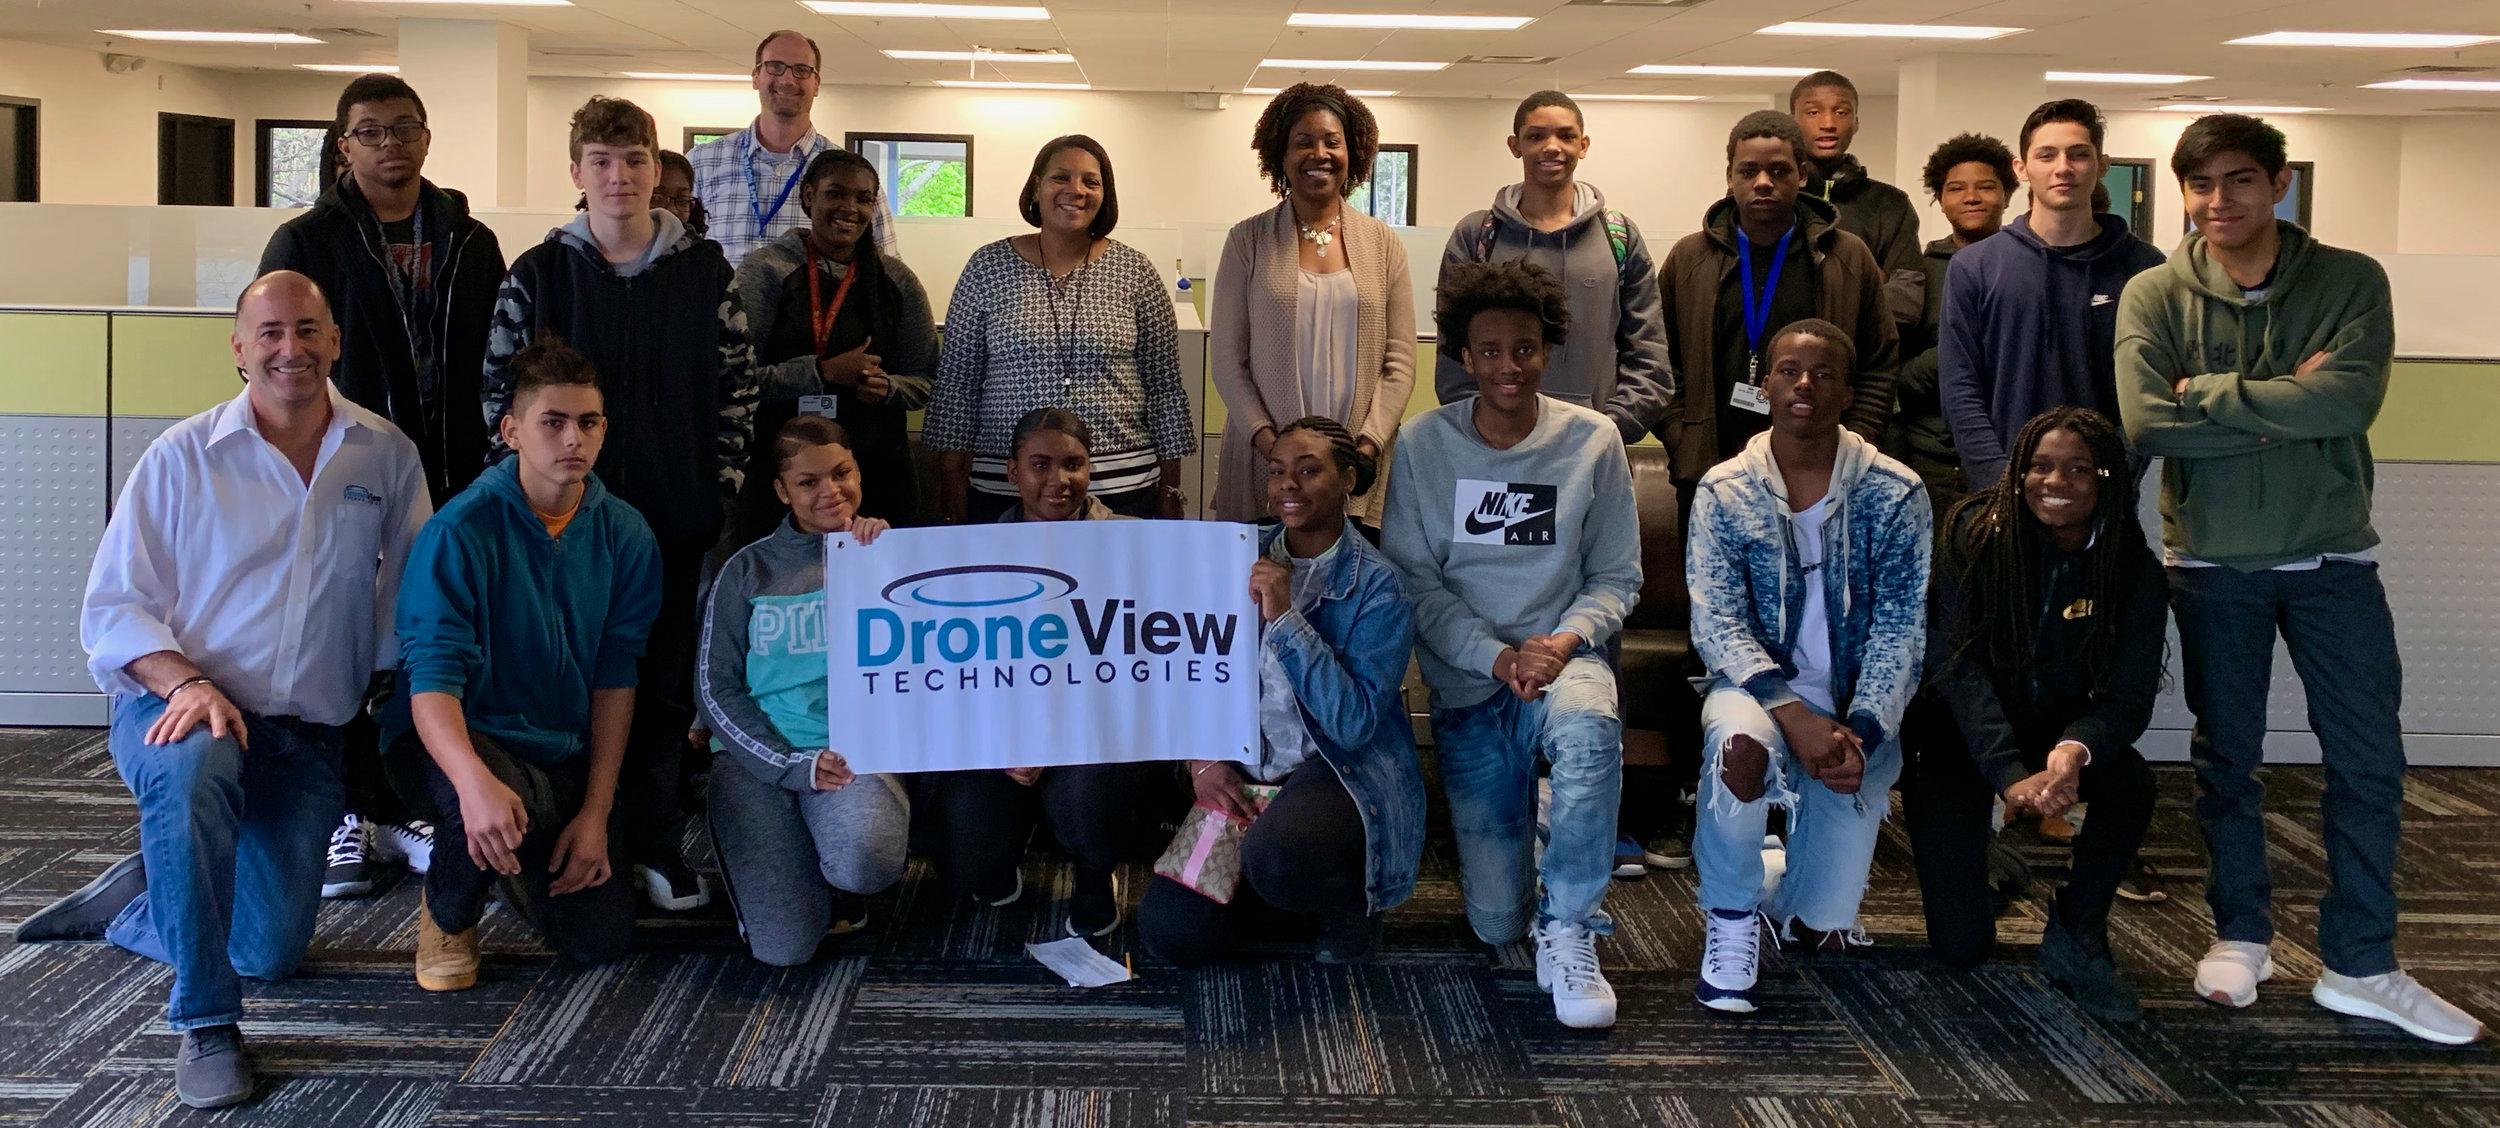 DroneView Technologies - Davis Aerospace Technical High School - 05-09-2019.jpg